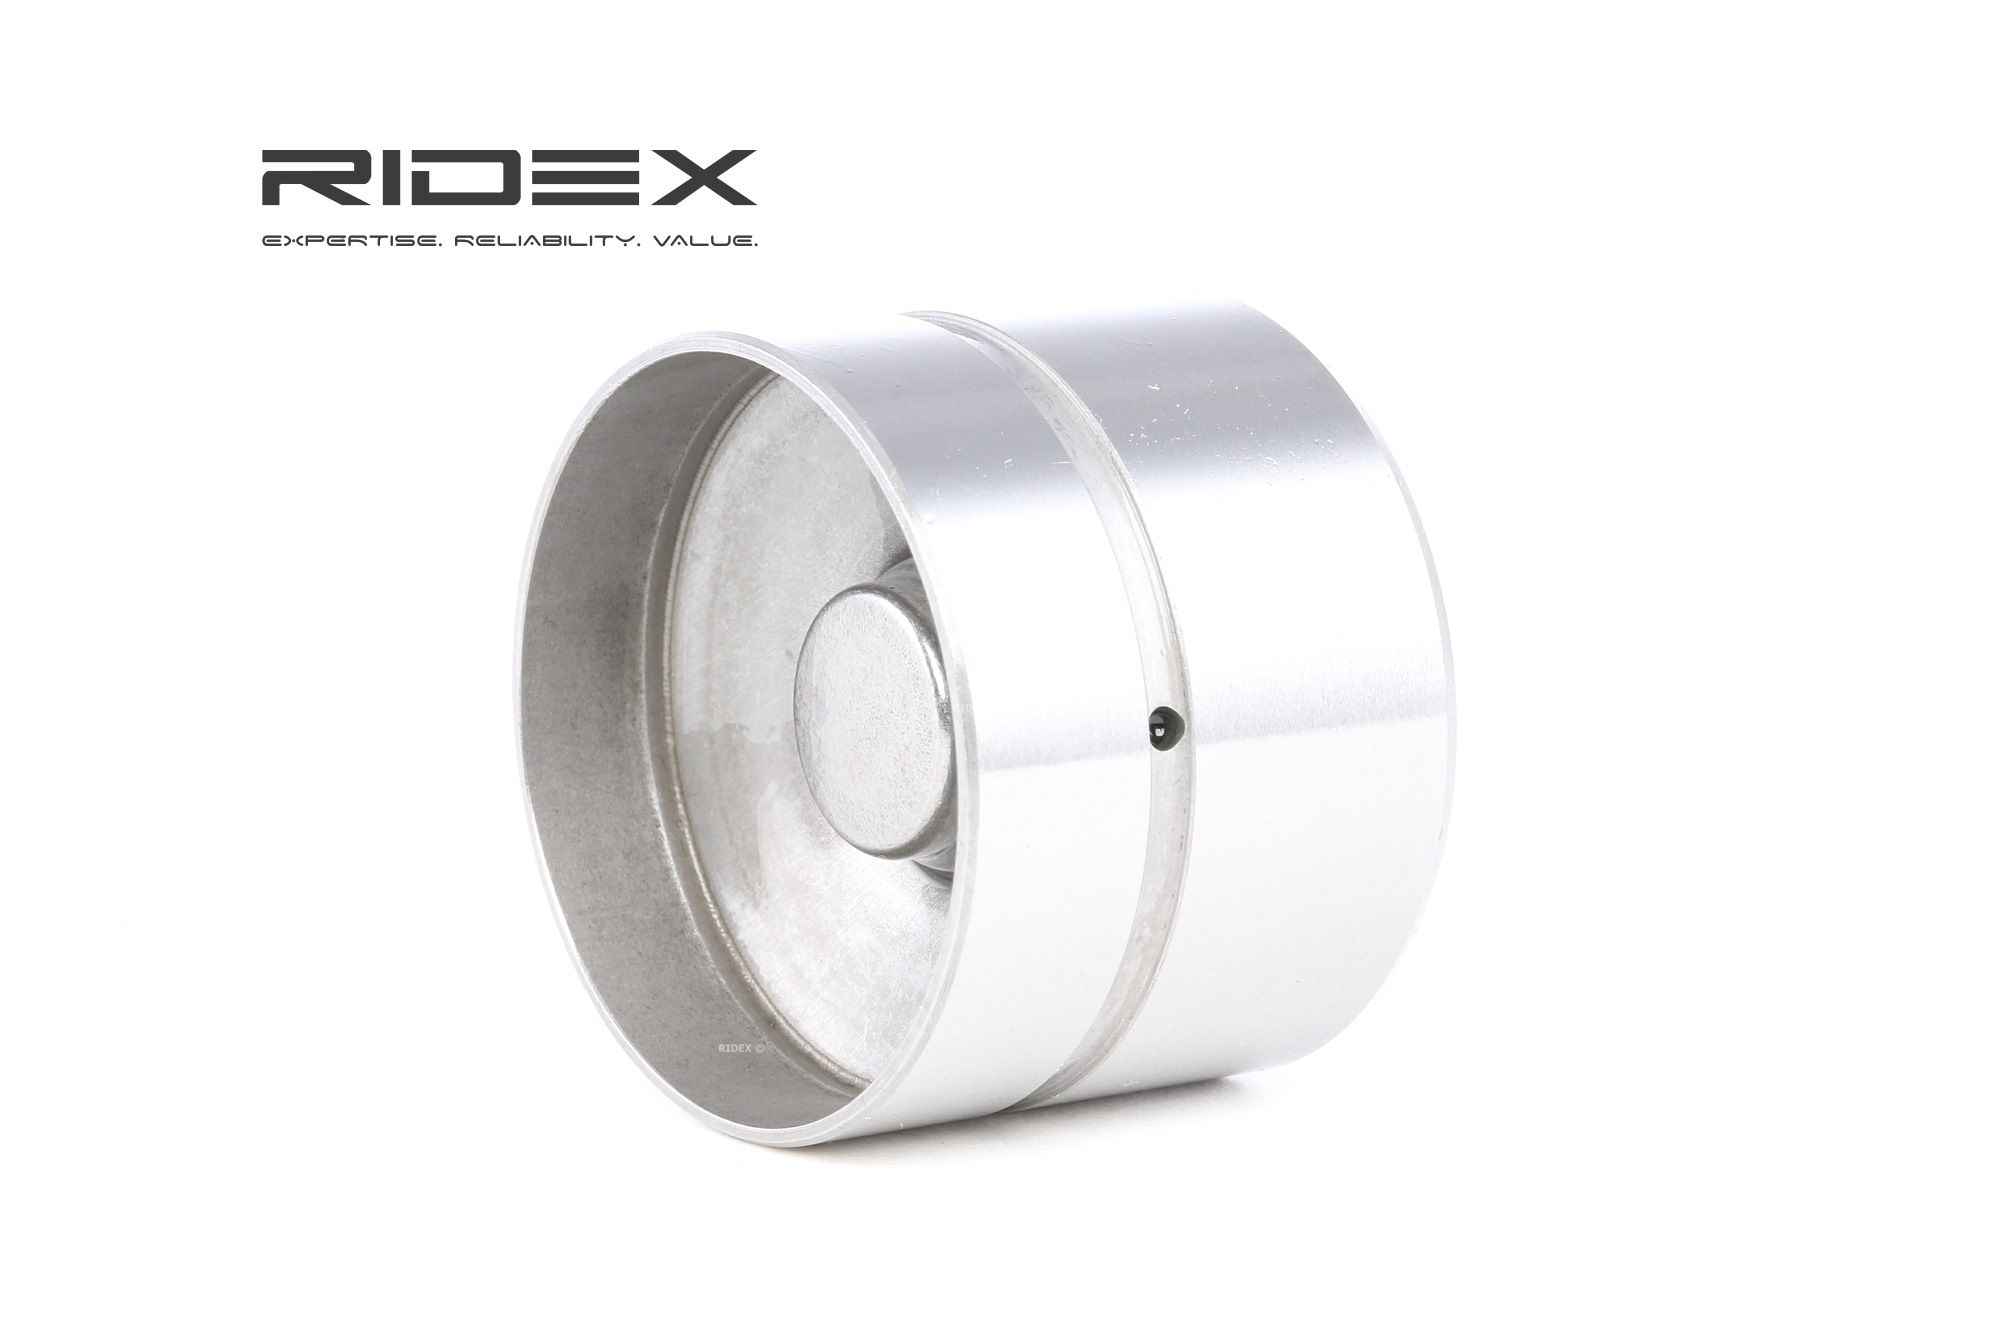 Stößel RIDEX 1216R0006 Bewertung